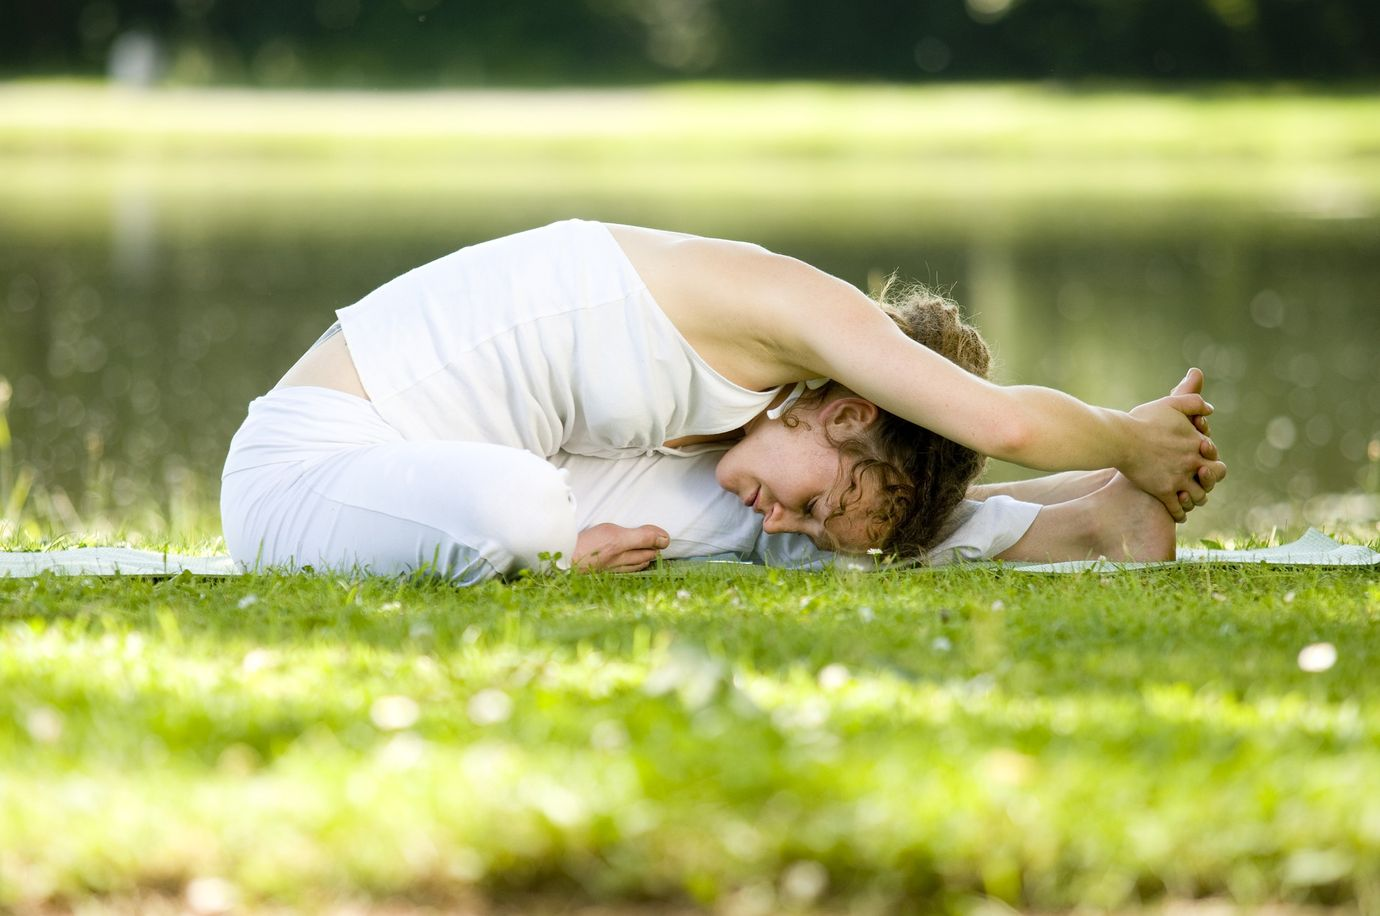 yoga-6128116_1920.jpg